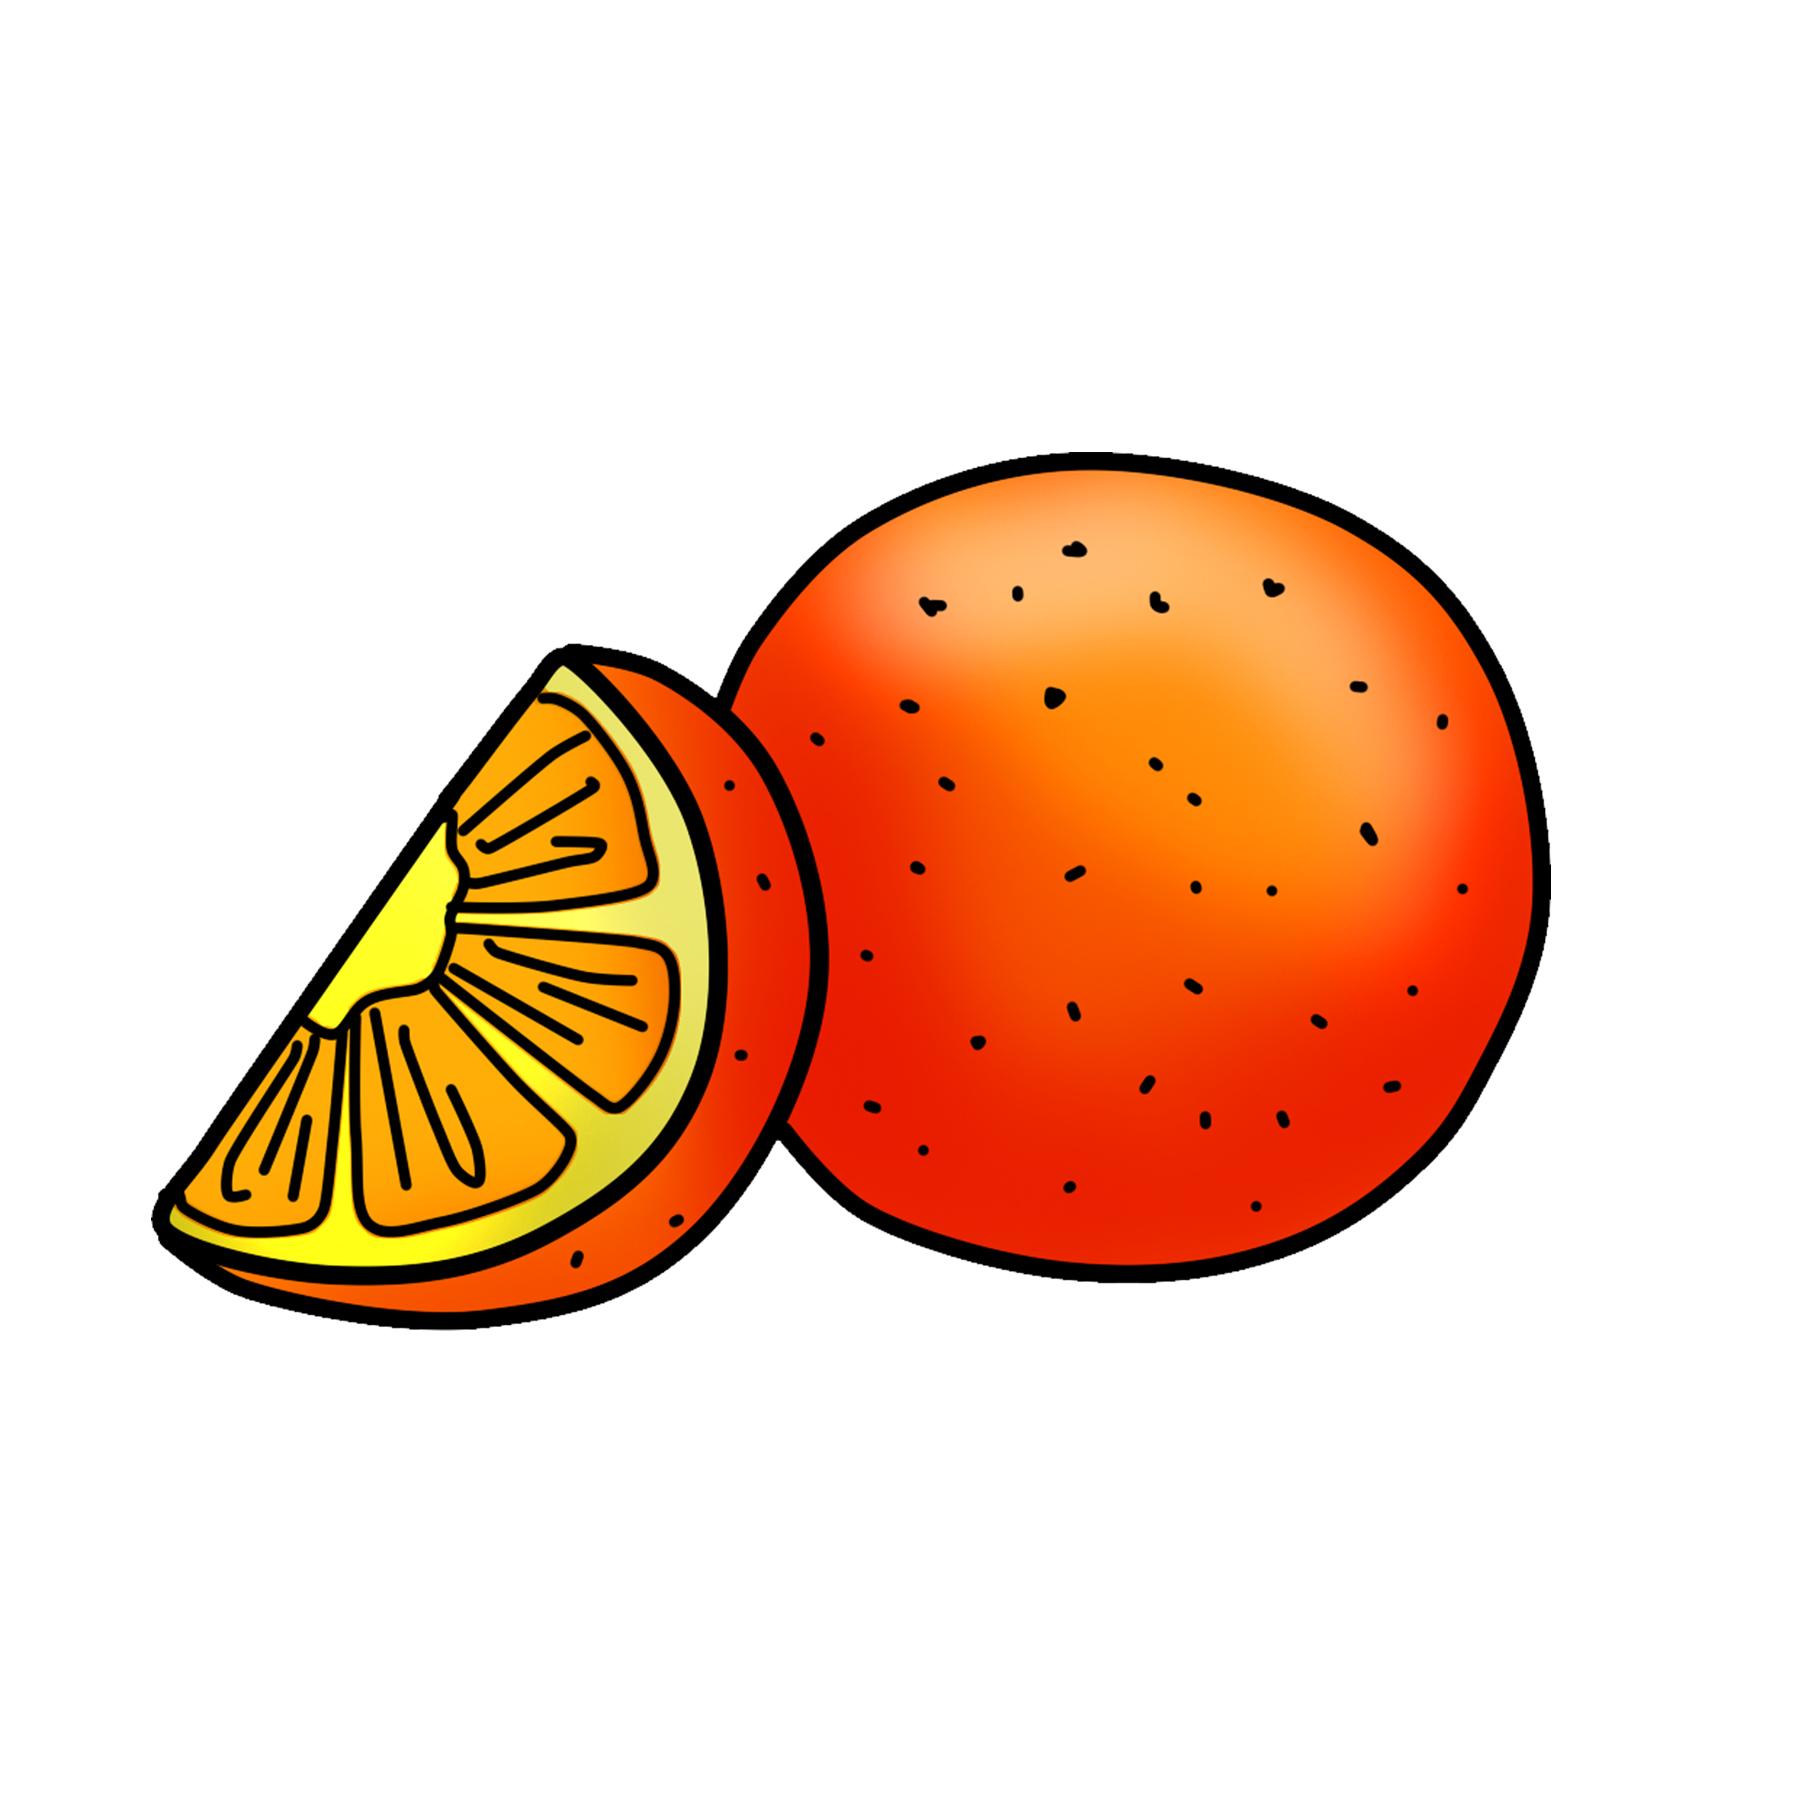 Orange pictures clipart jpg freeuse download Orange Clipart Graphic PNG Download | Clipart 4 School jpg freeuse download